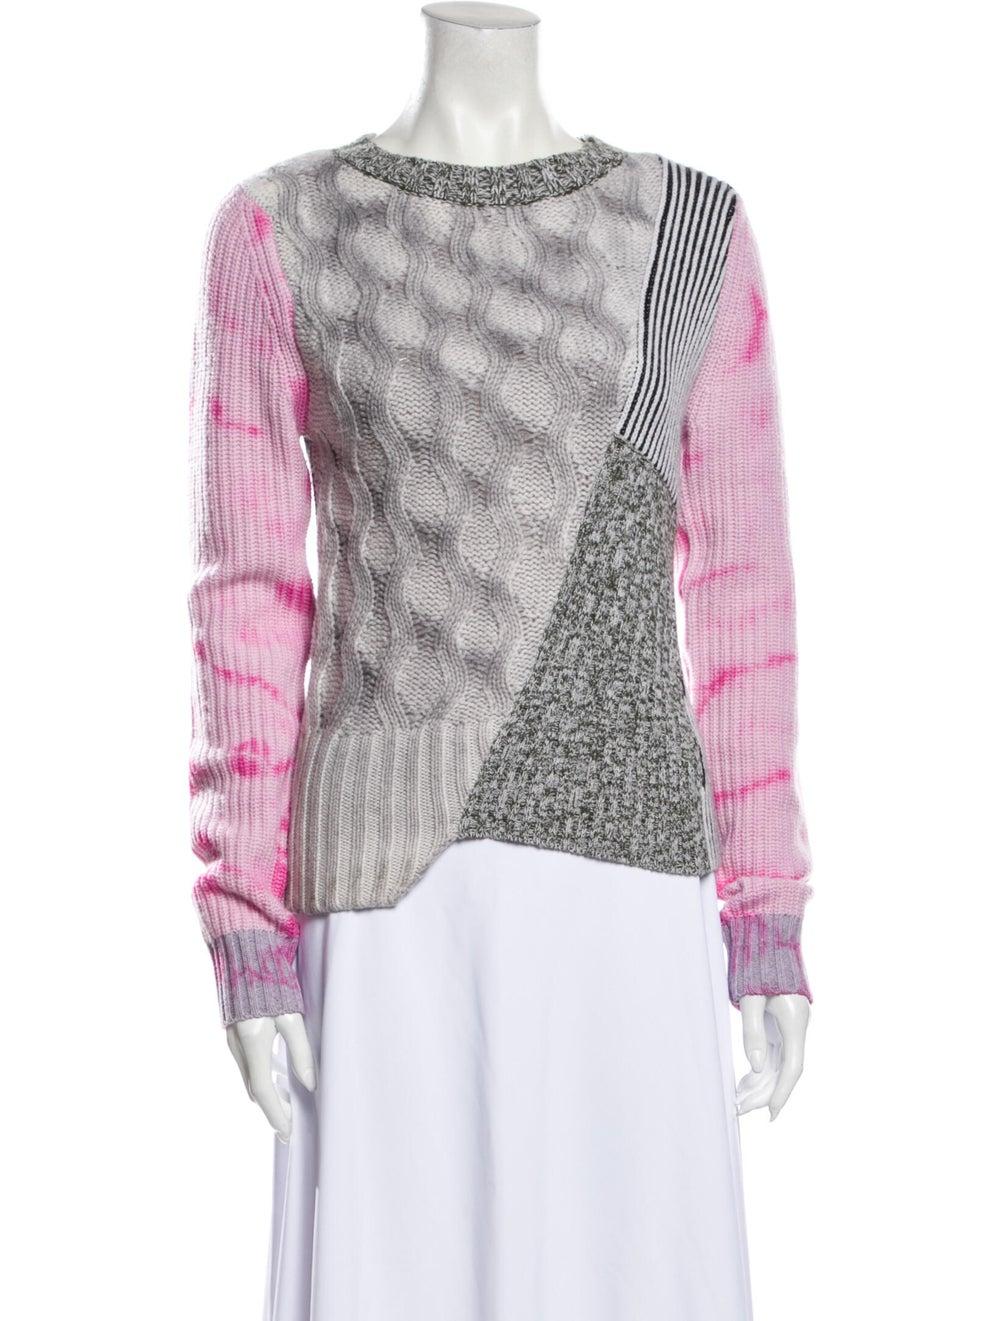 Zoë Jordan Wool Tie-Dye Print Sweater Wool - image 1